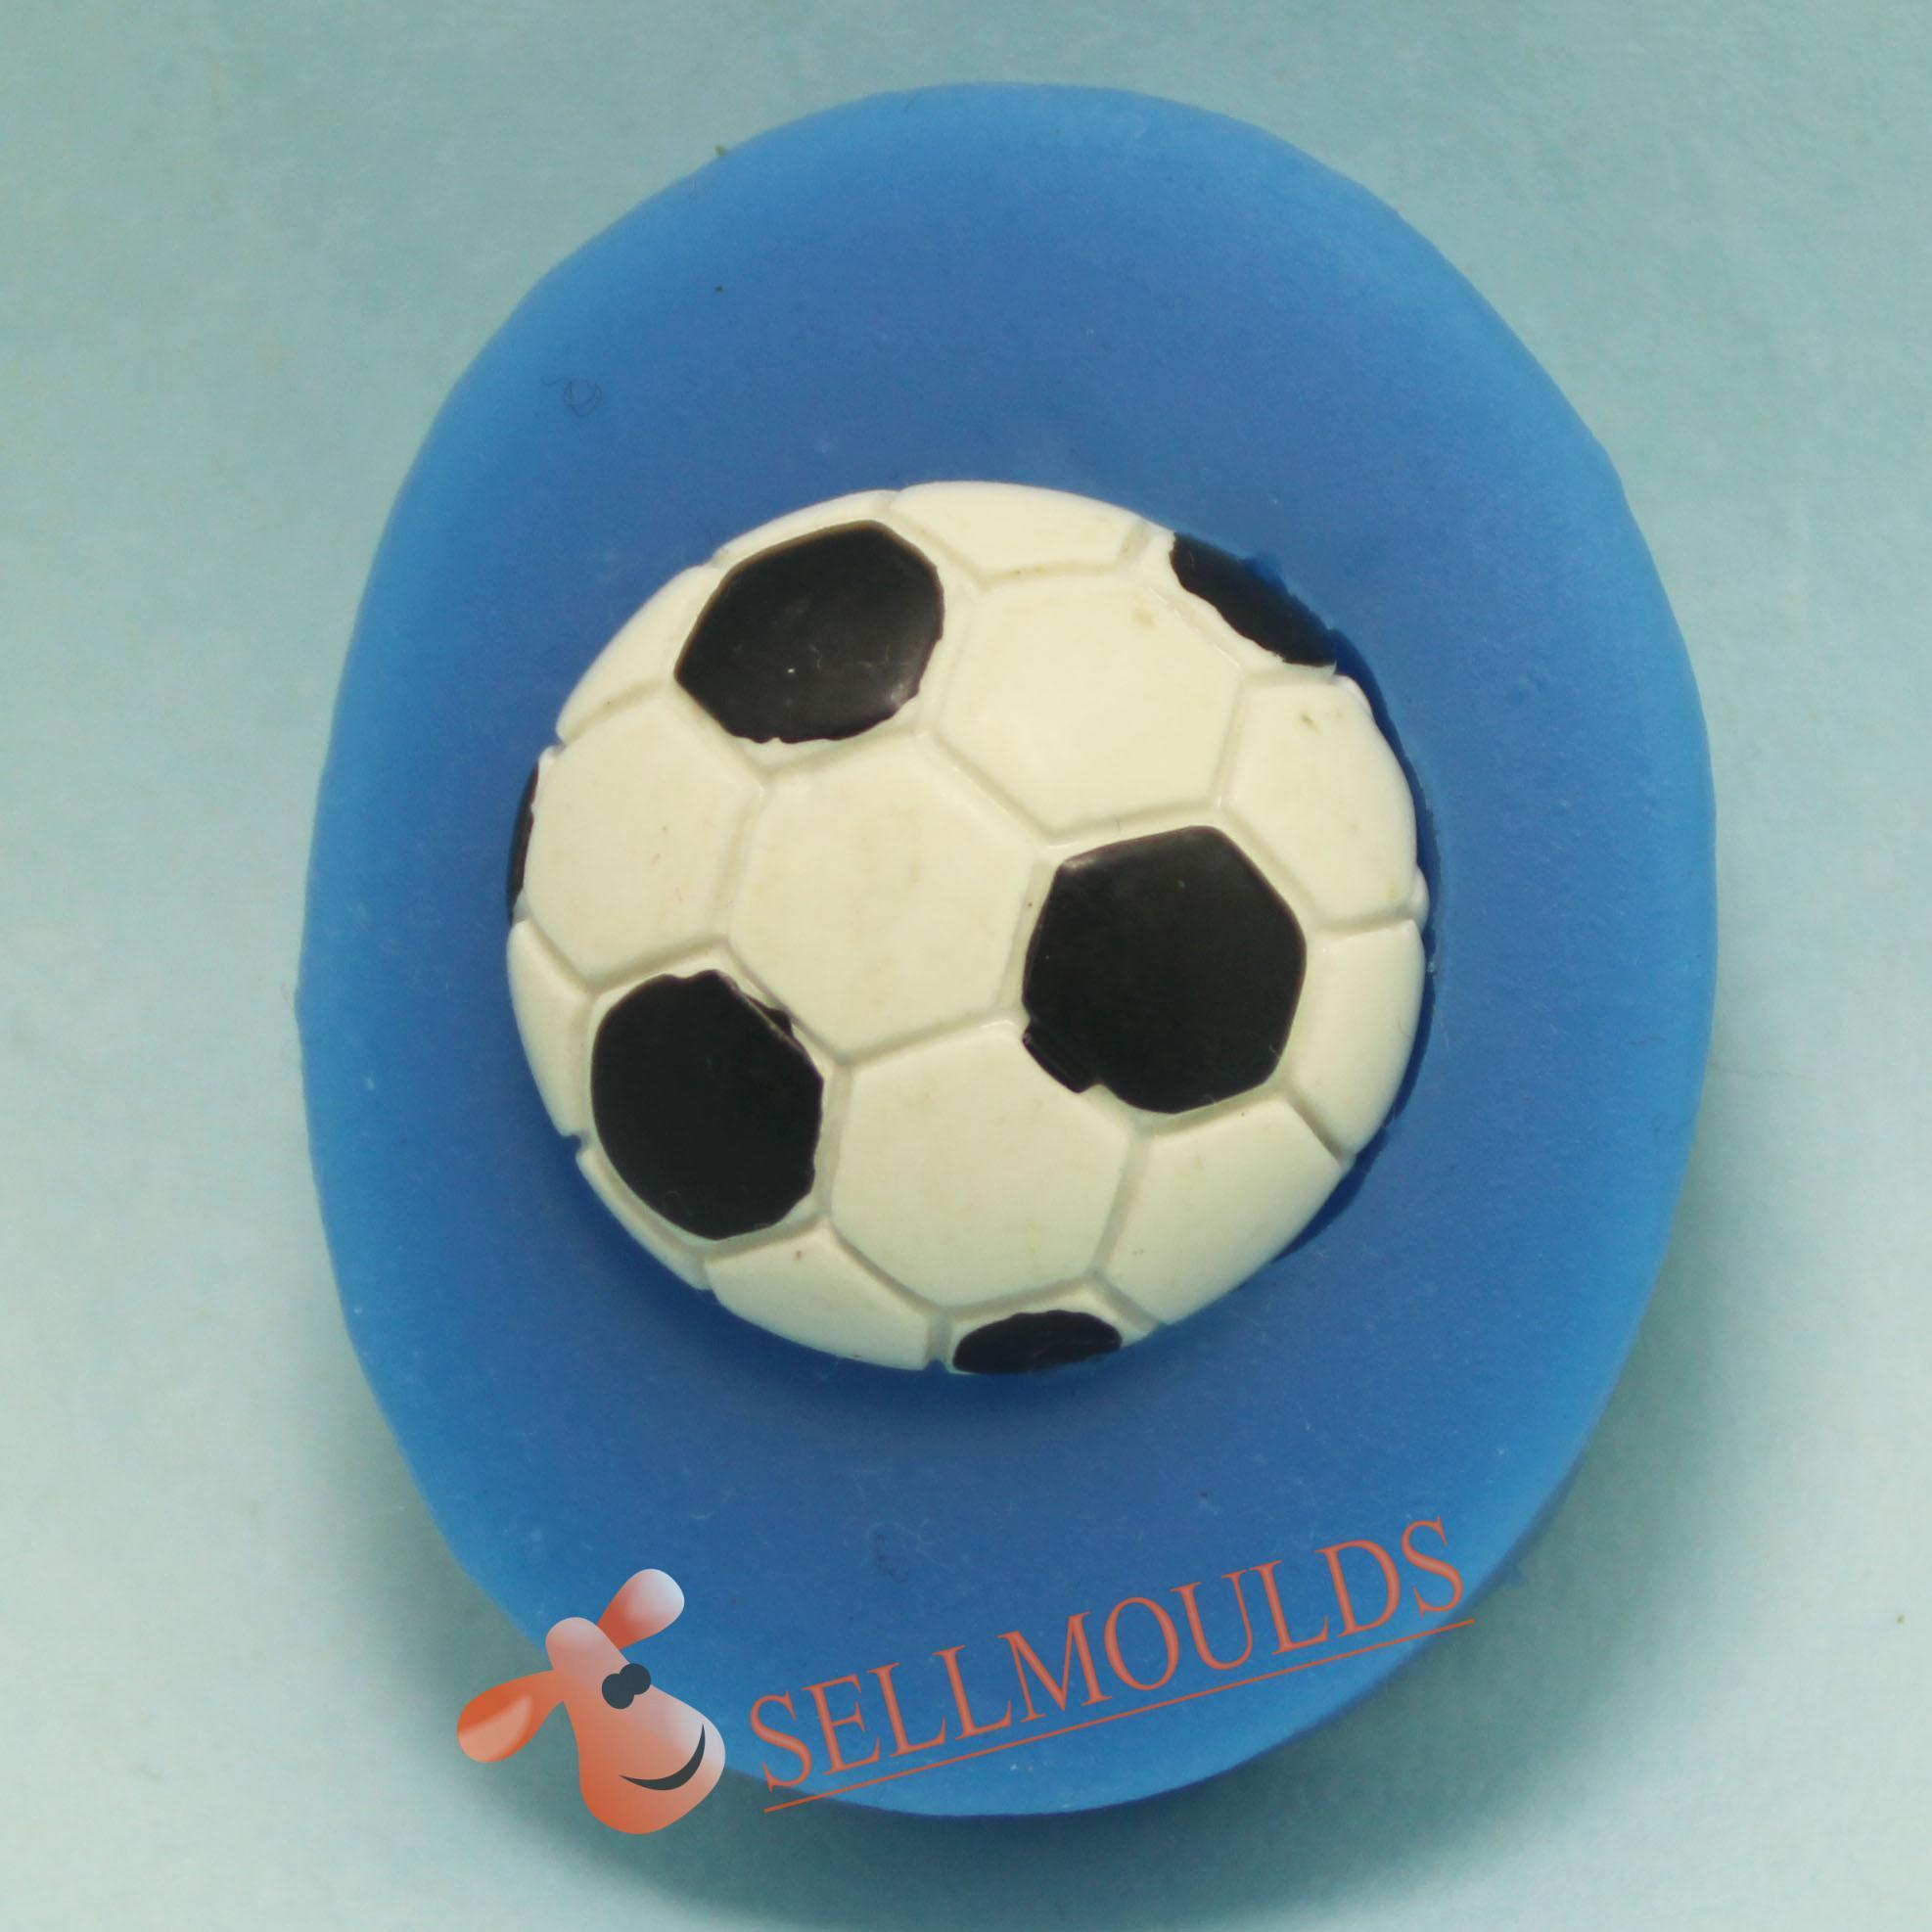 Fondant Cake Silicone Molds : Football-chocolate-silicone-mold-Handmade-Fondant-Cake ...